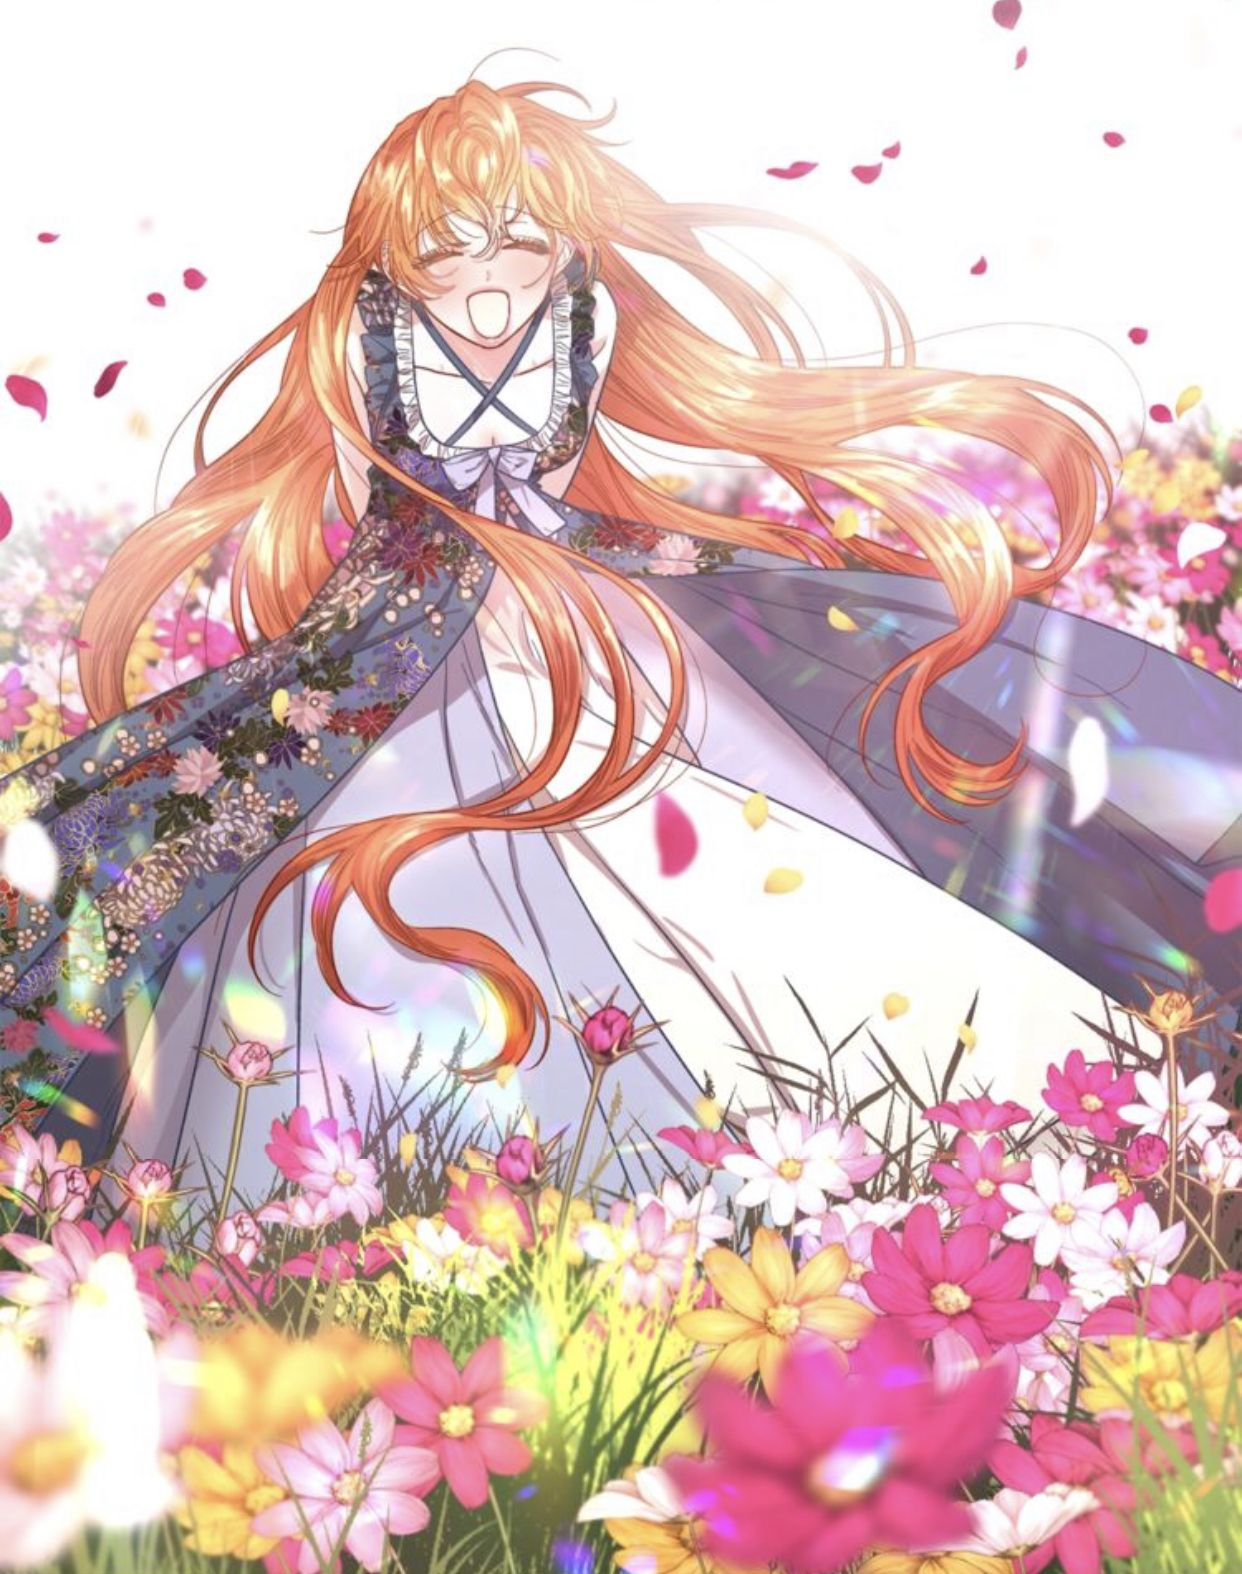 Pin by Amy Ly on Manhua Manhwa in 2020 Manga english